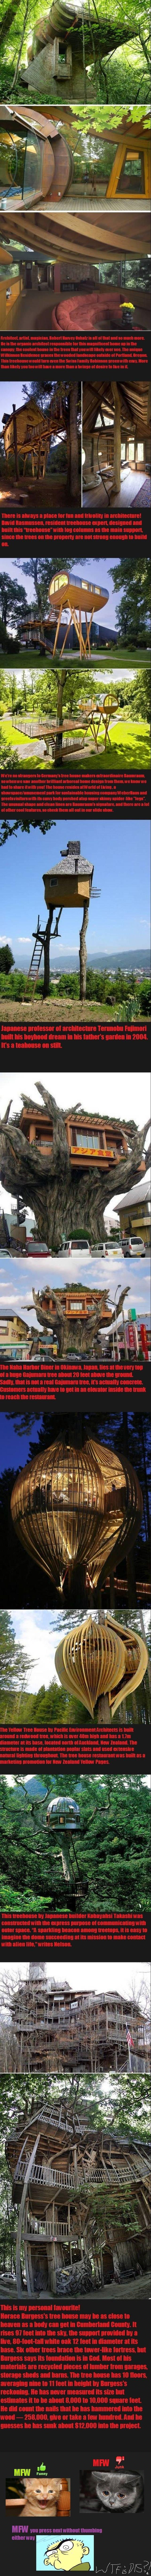 Amazing Tree Houses. Mmmmmm..... bitch please noep